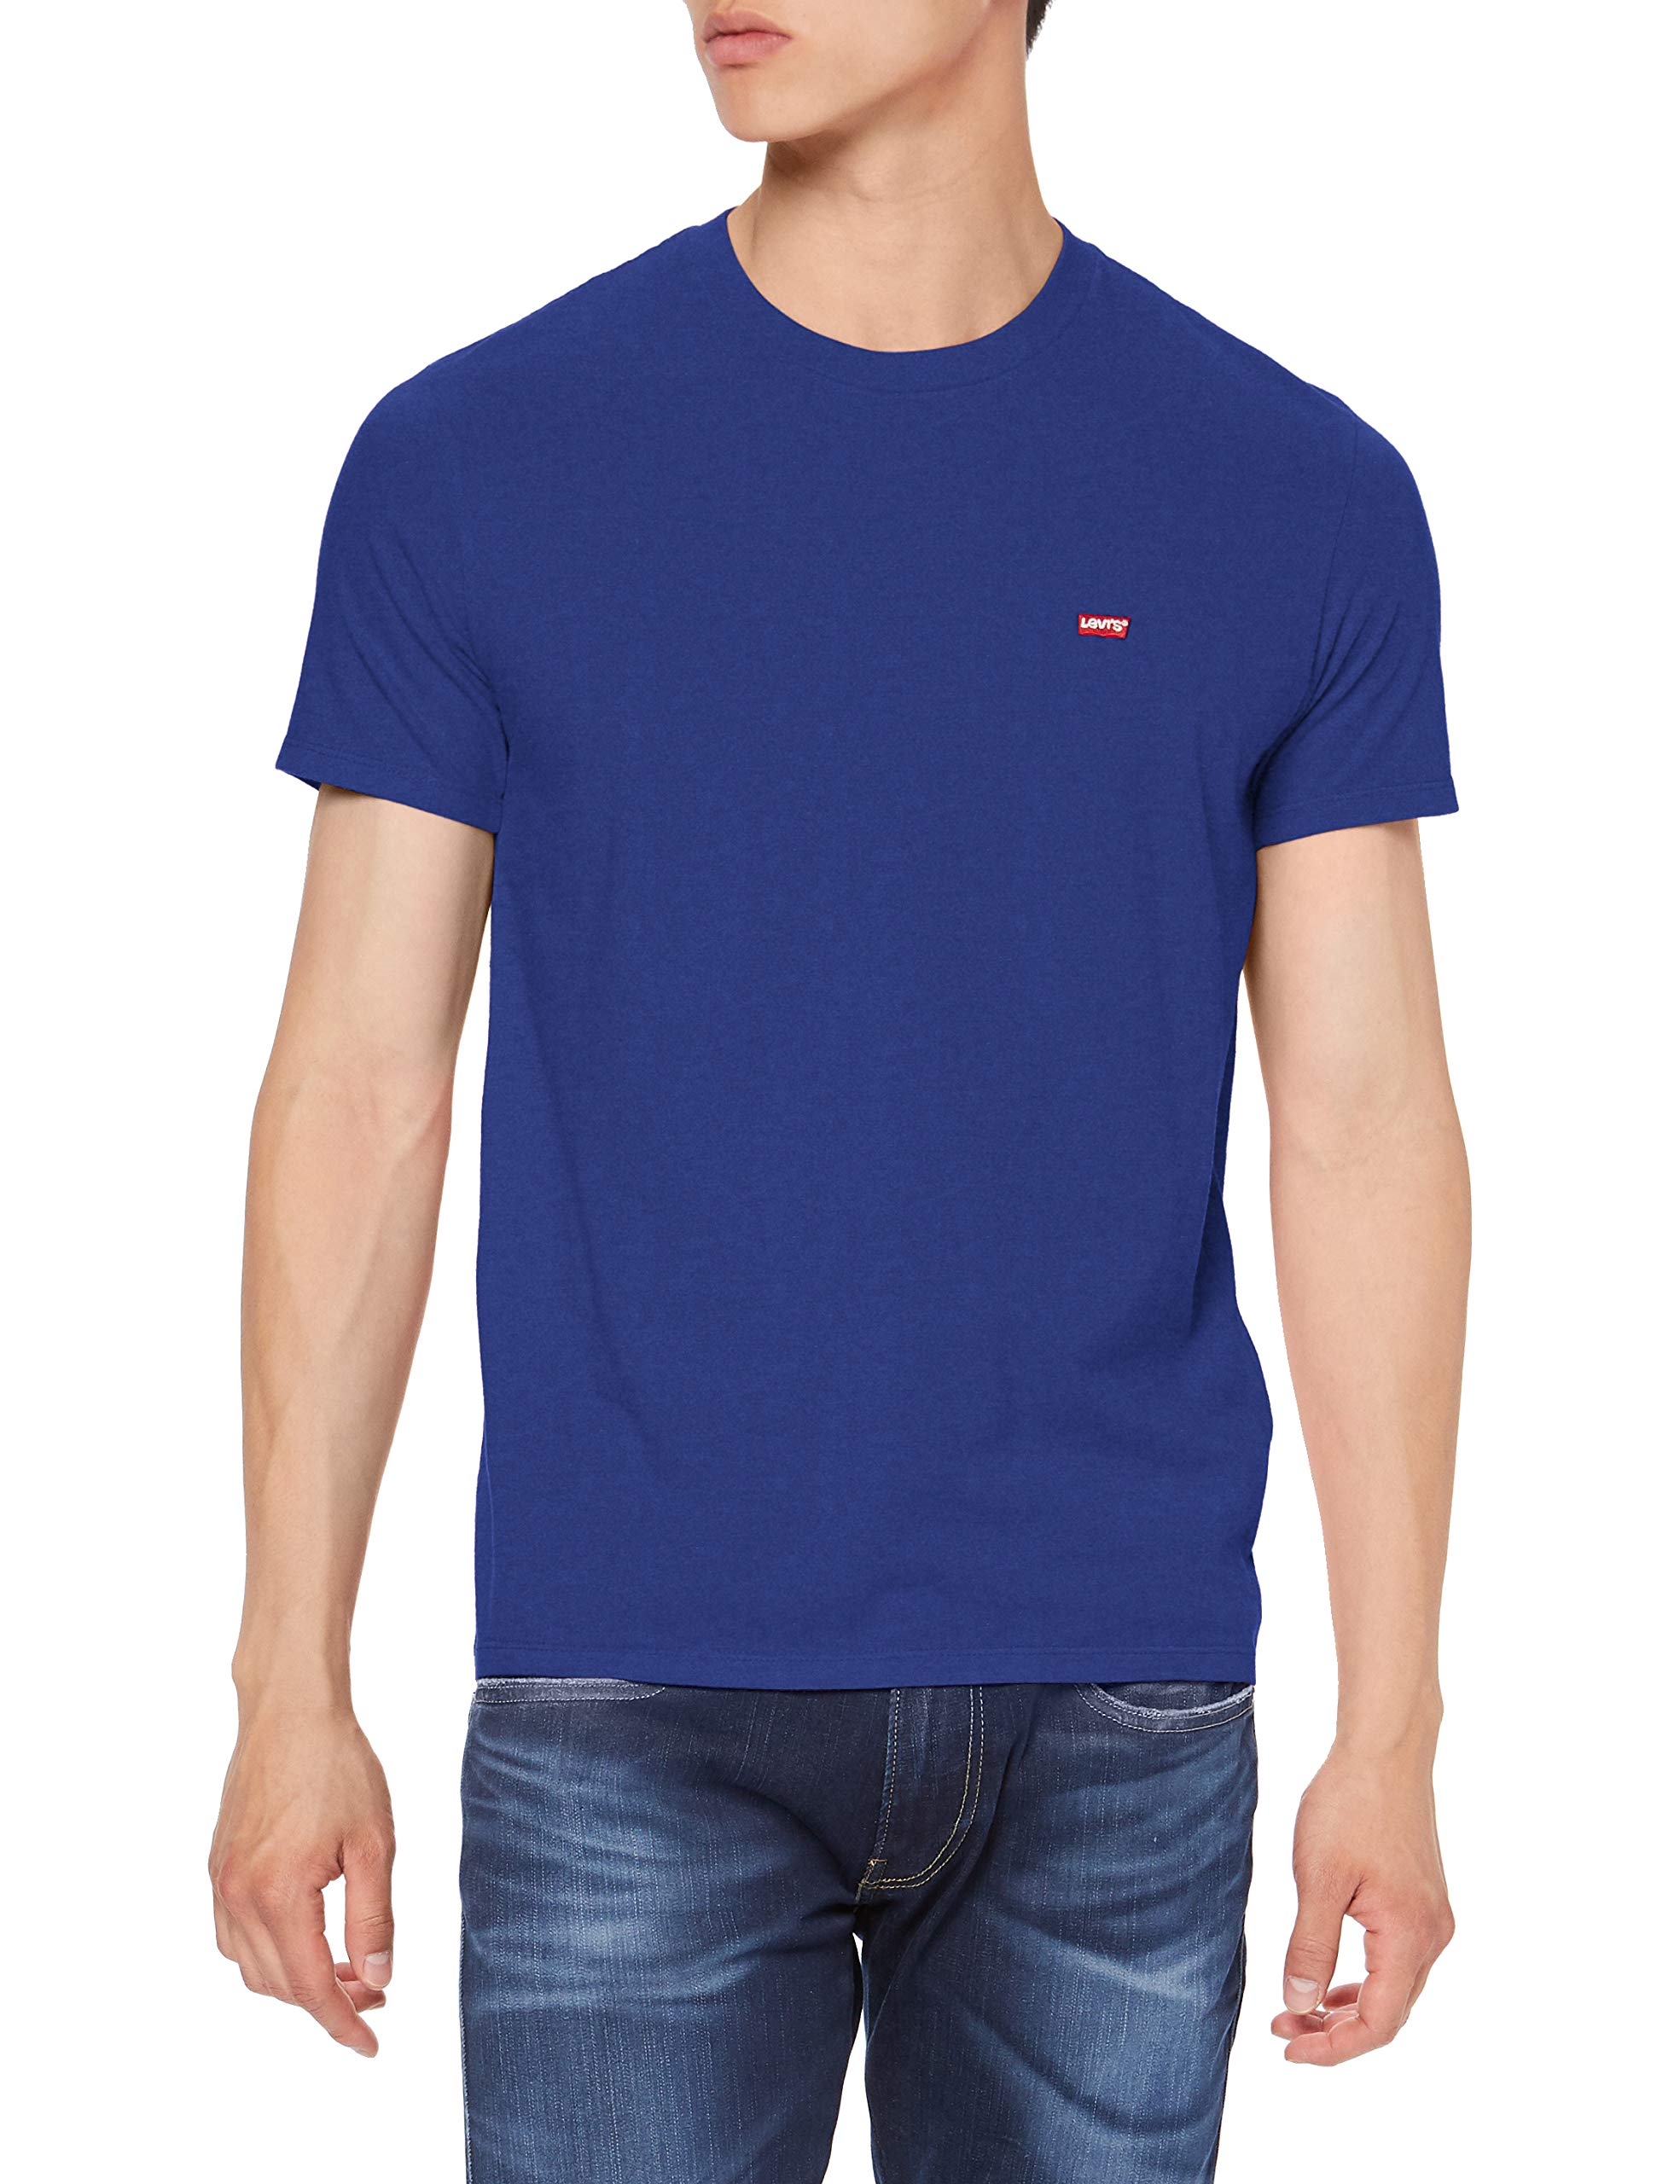 Levi's SS Original HM Tee T-Shirt Uomo 1 spesavip